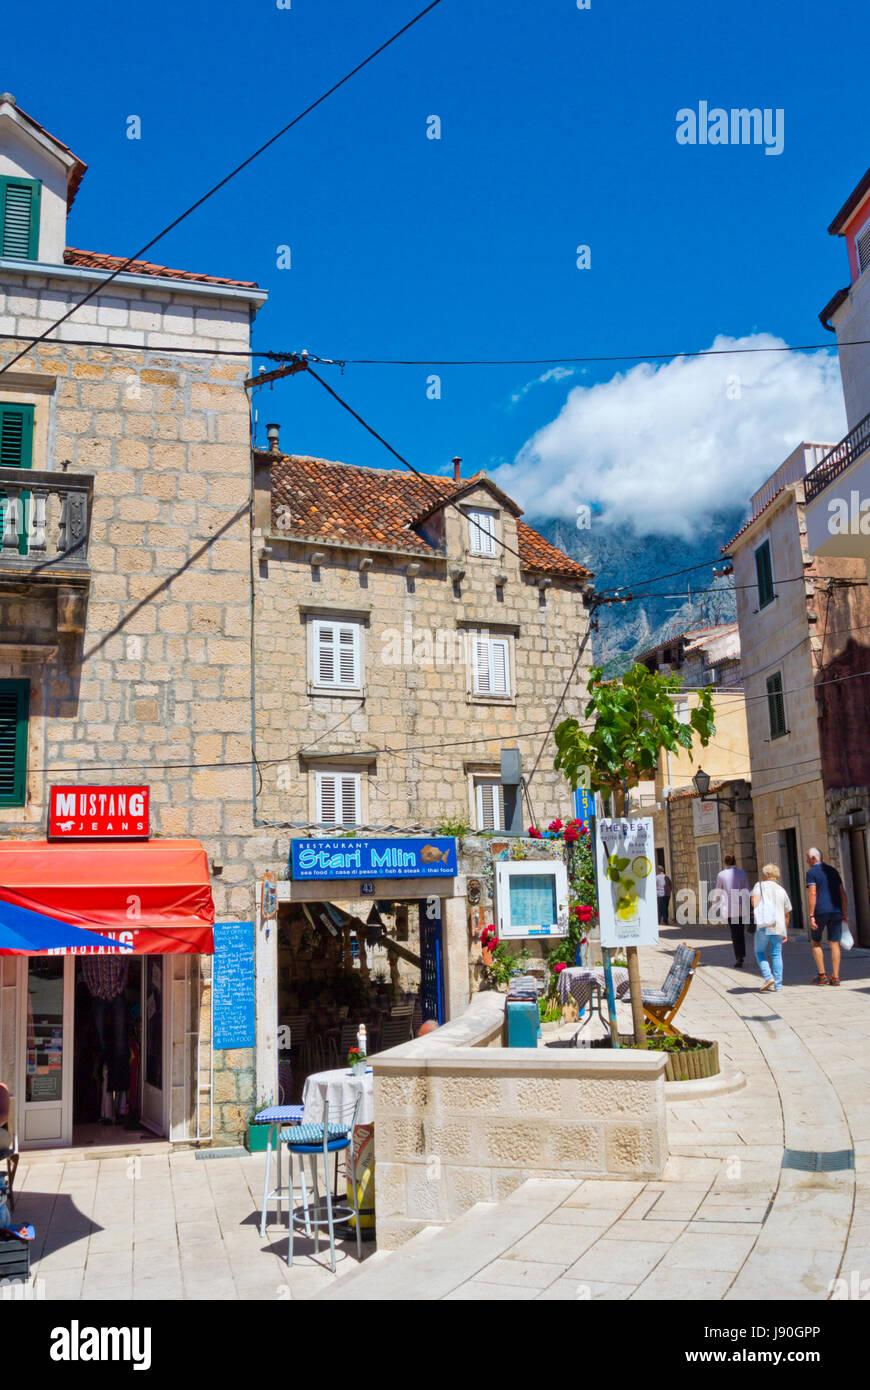 Stari Mlin restaurant and shops, Kalalarga, Kala Larga, Siroka ulice, Makarska, Dalmatia, Croatia Stock Photo